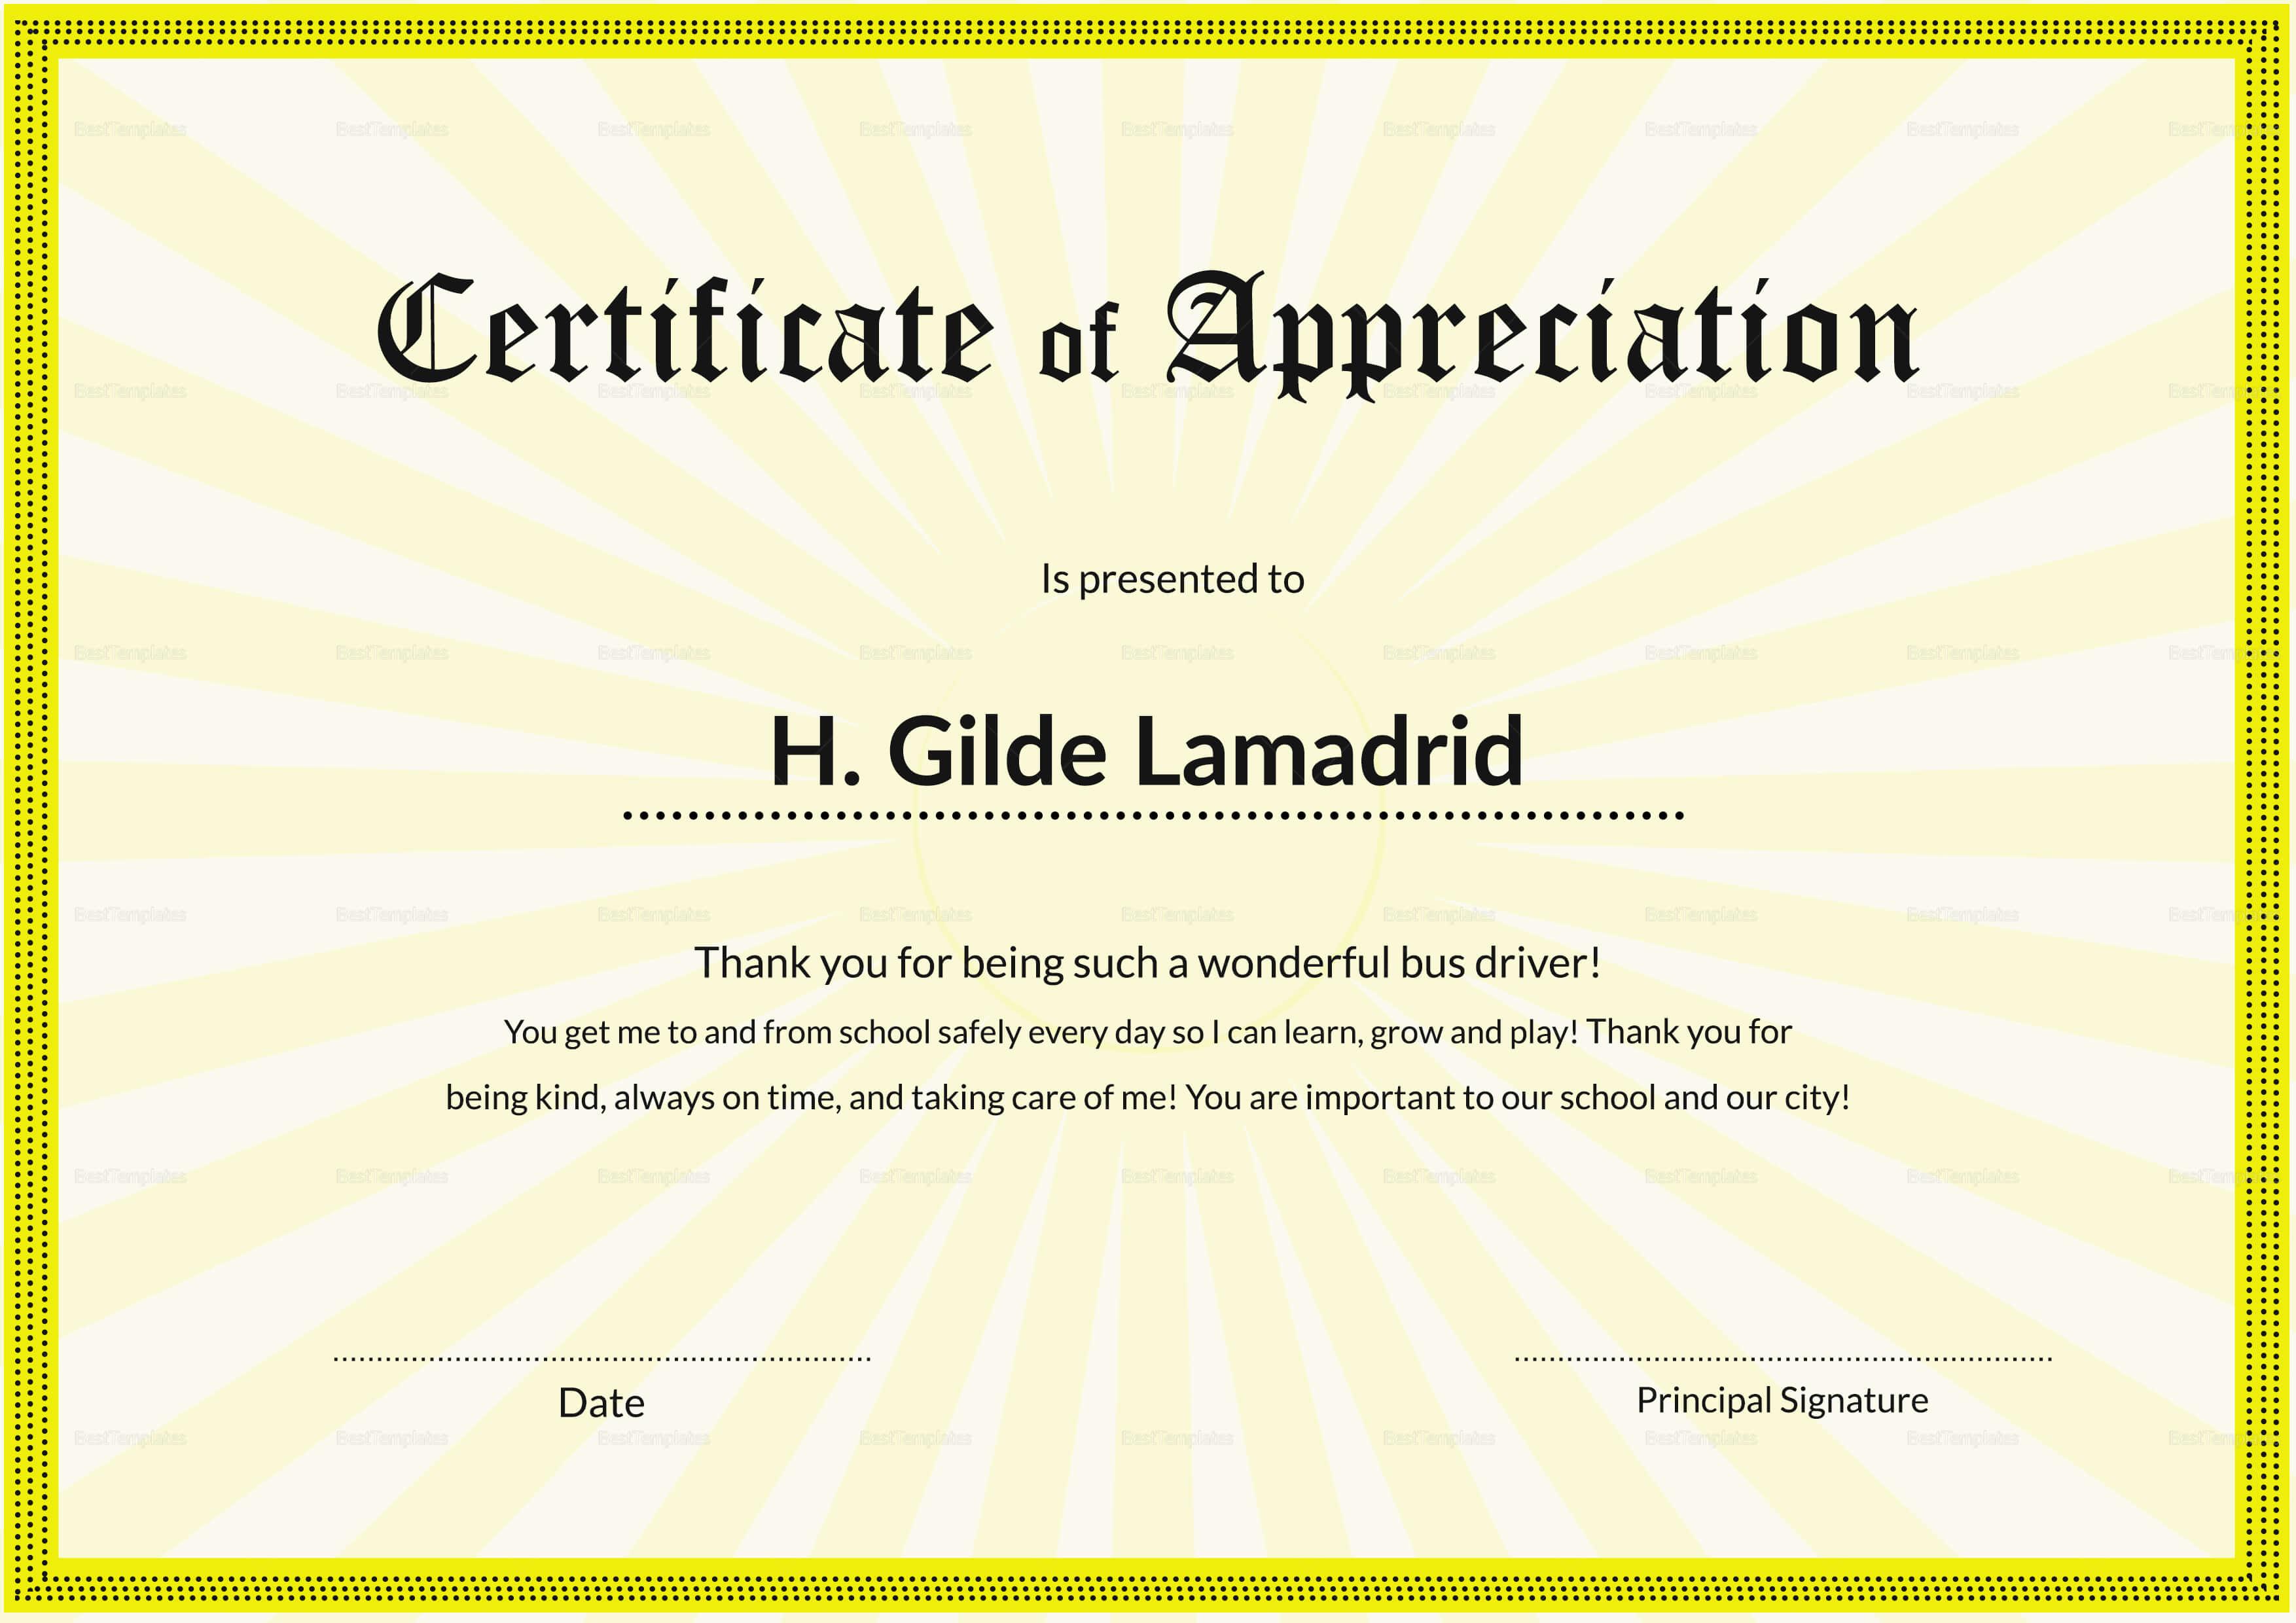 Certificate Of School Appreciation Template regarding Certificate Templates For School